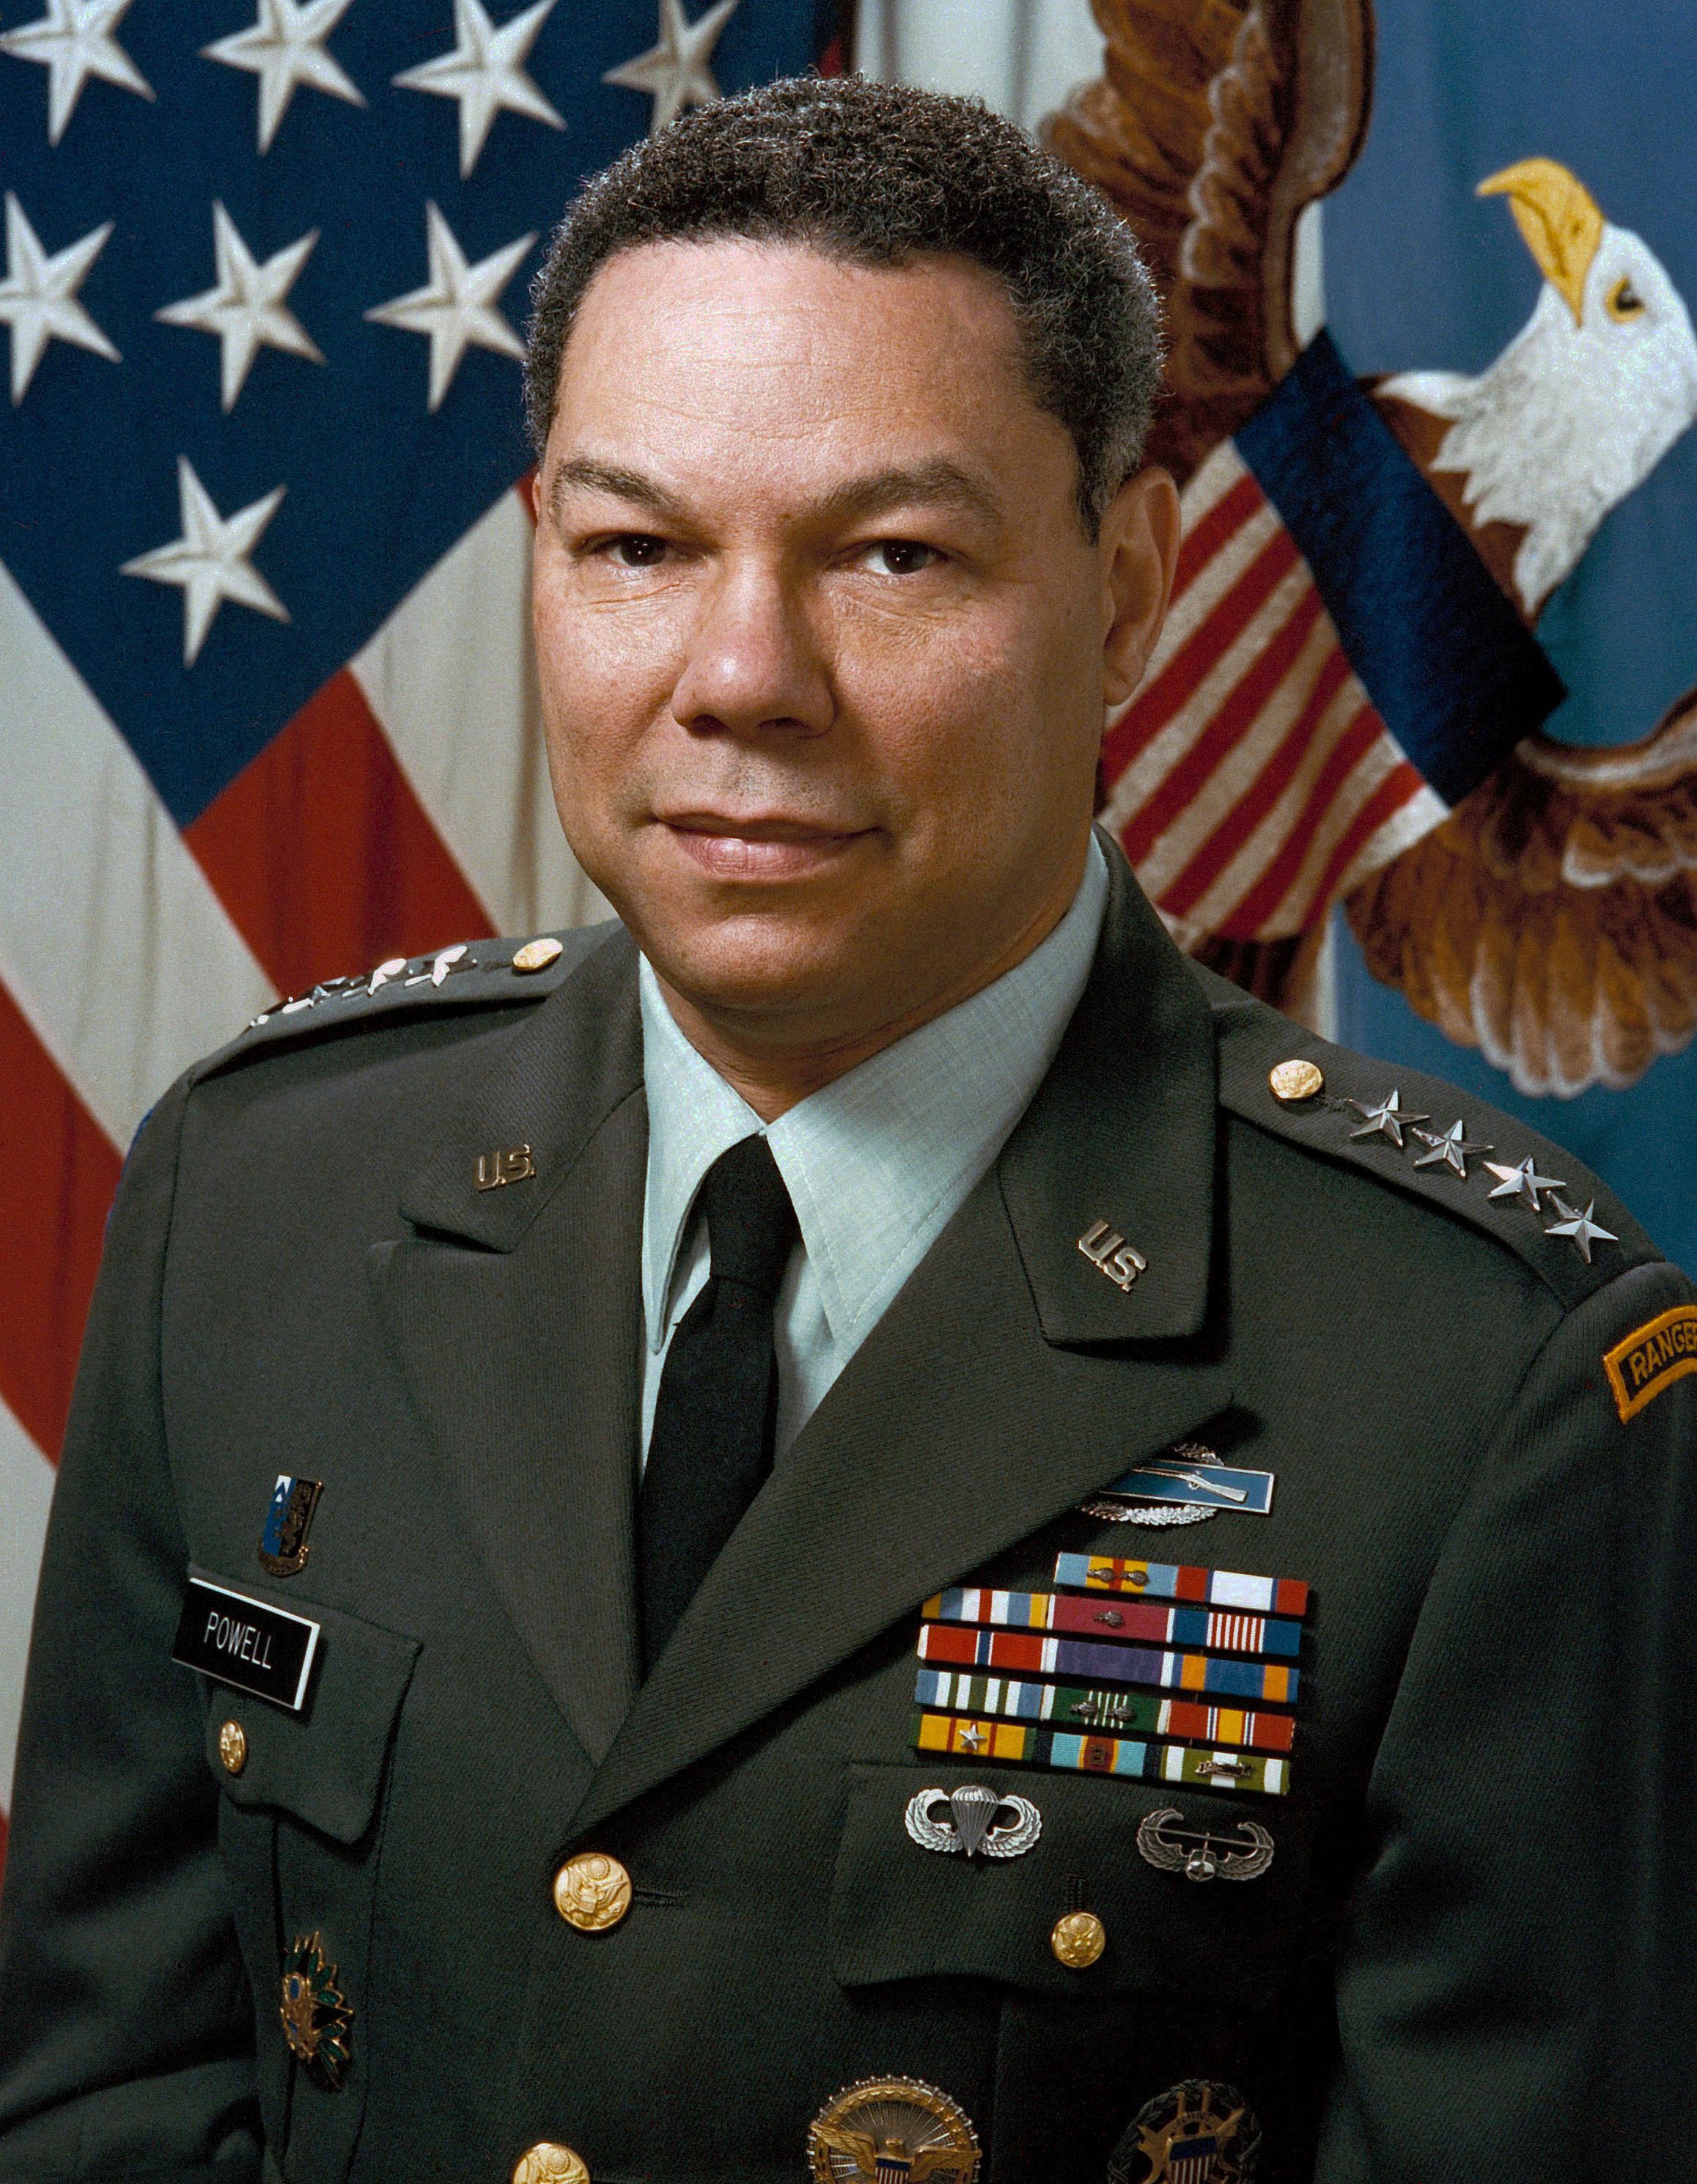 https://upload.wikimedia.org/wikipedia/commons/e/e9/GEN_Colin_Powell.JPG